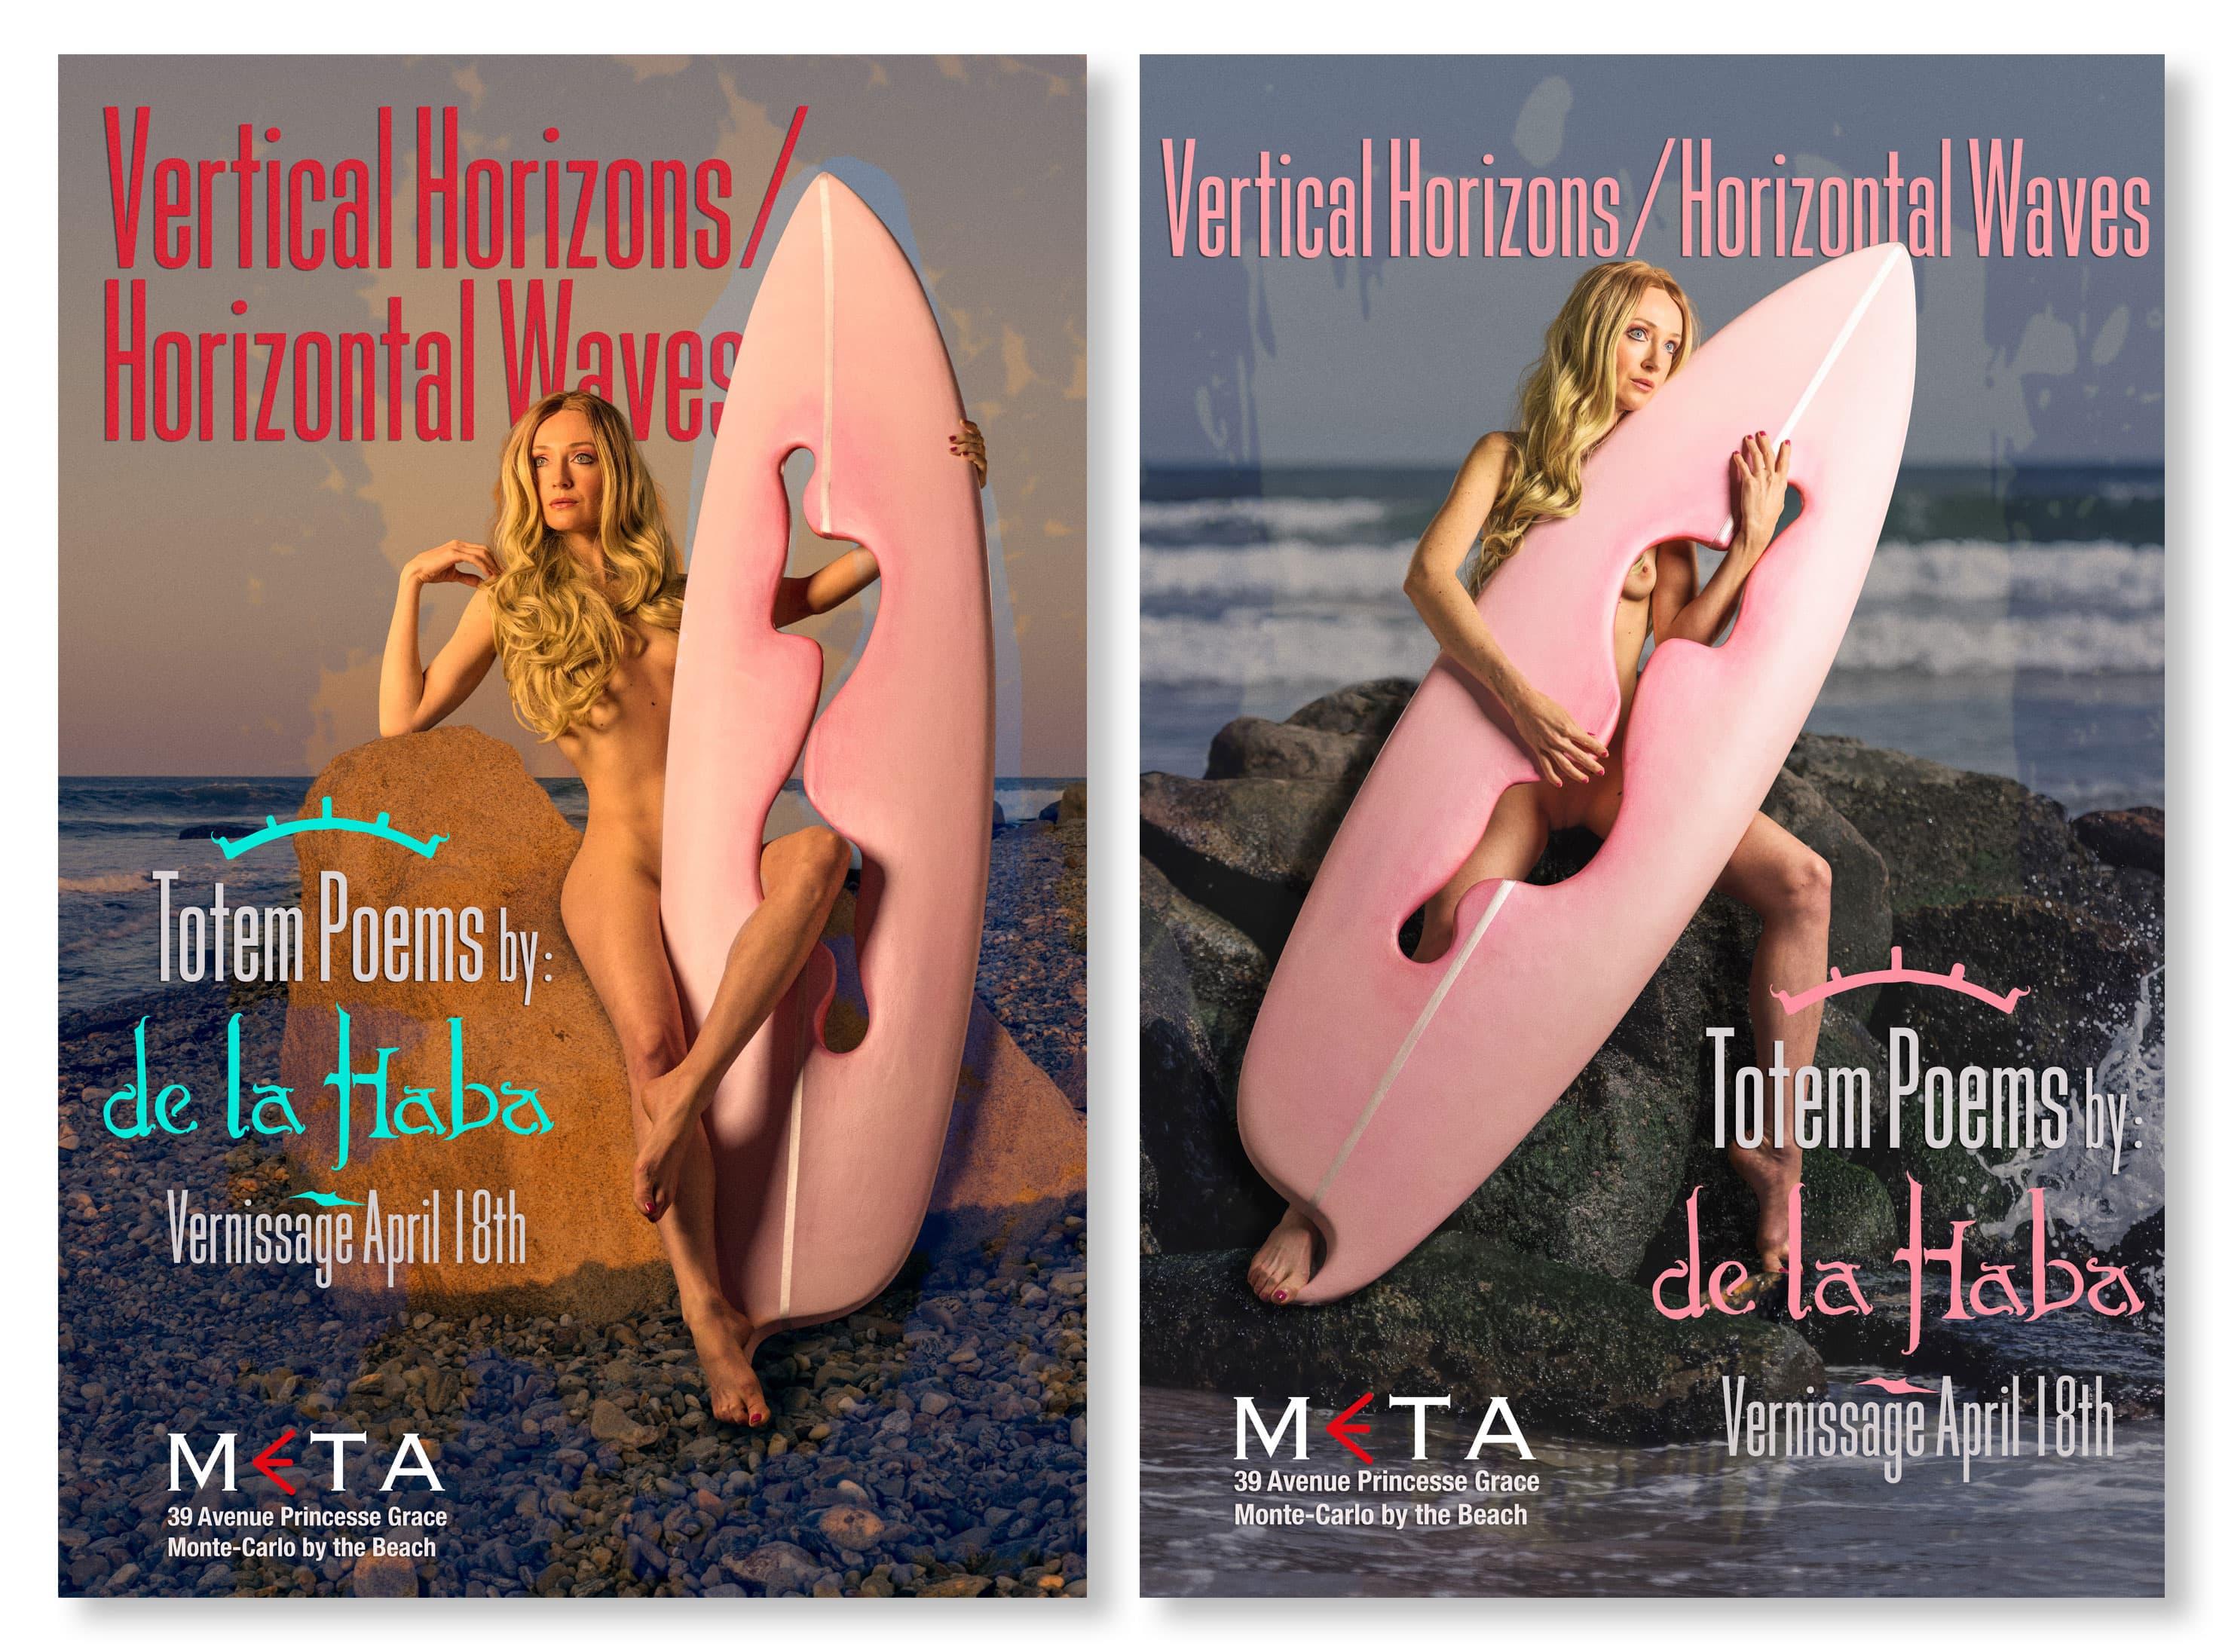 Vertical Horizons/Horizontal Waves Poster